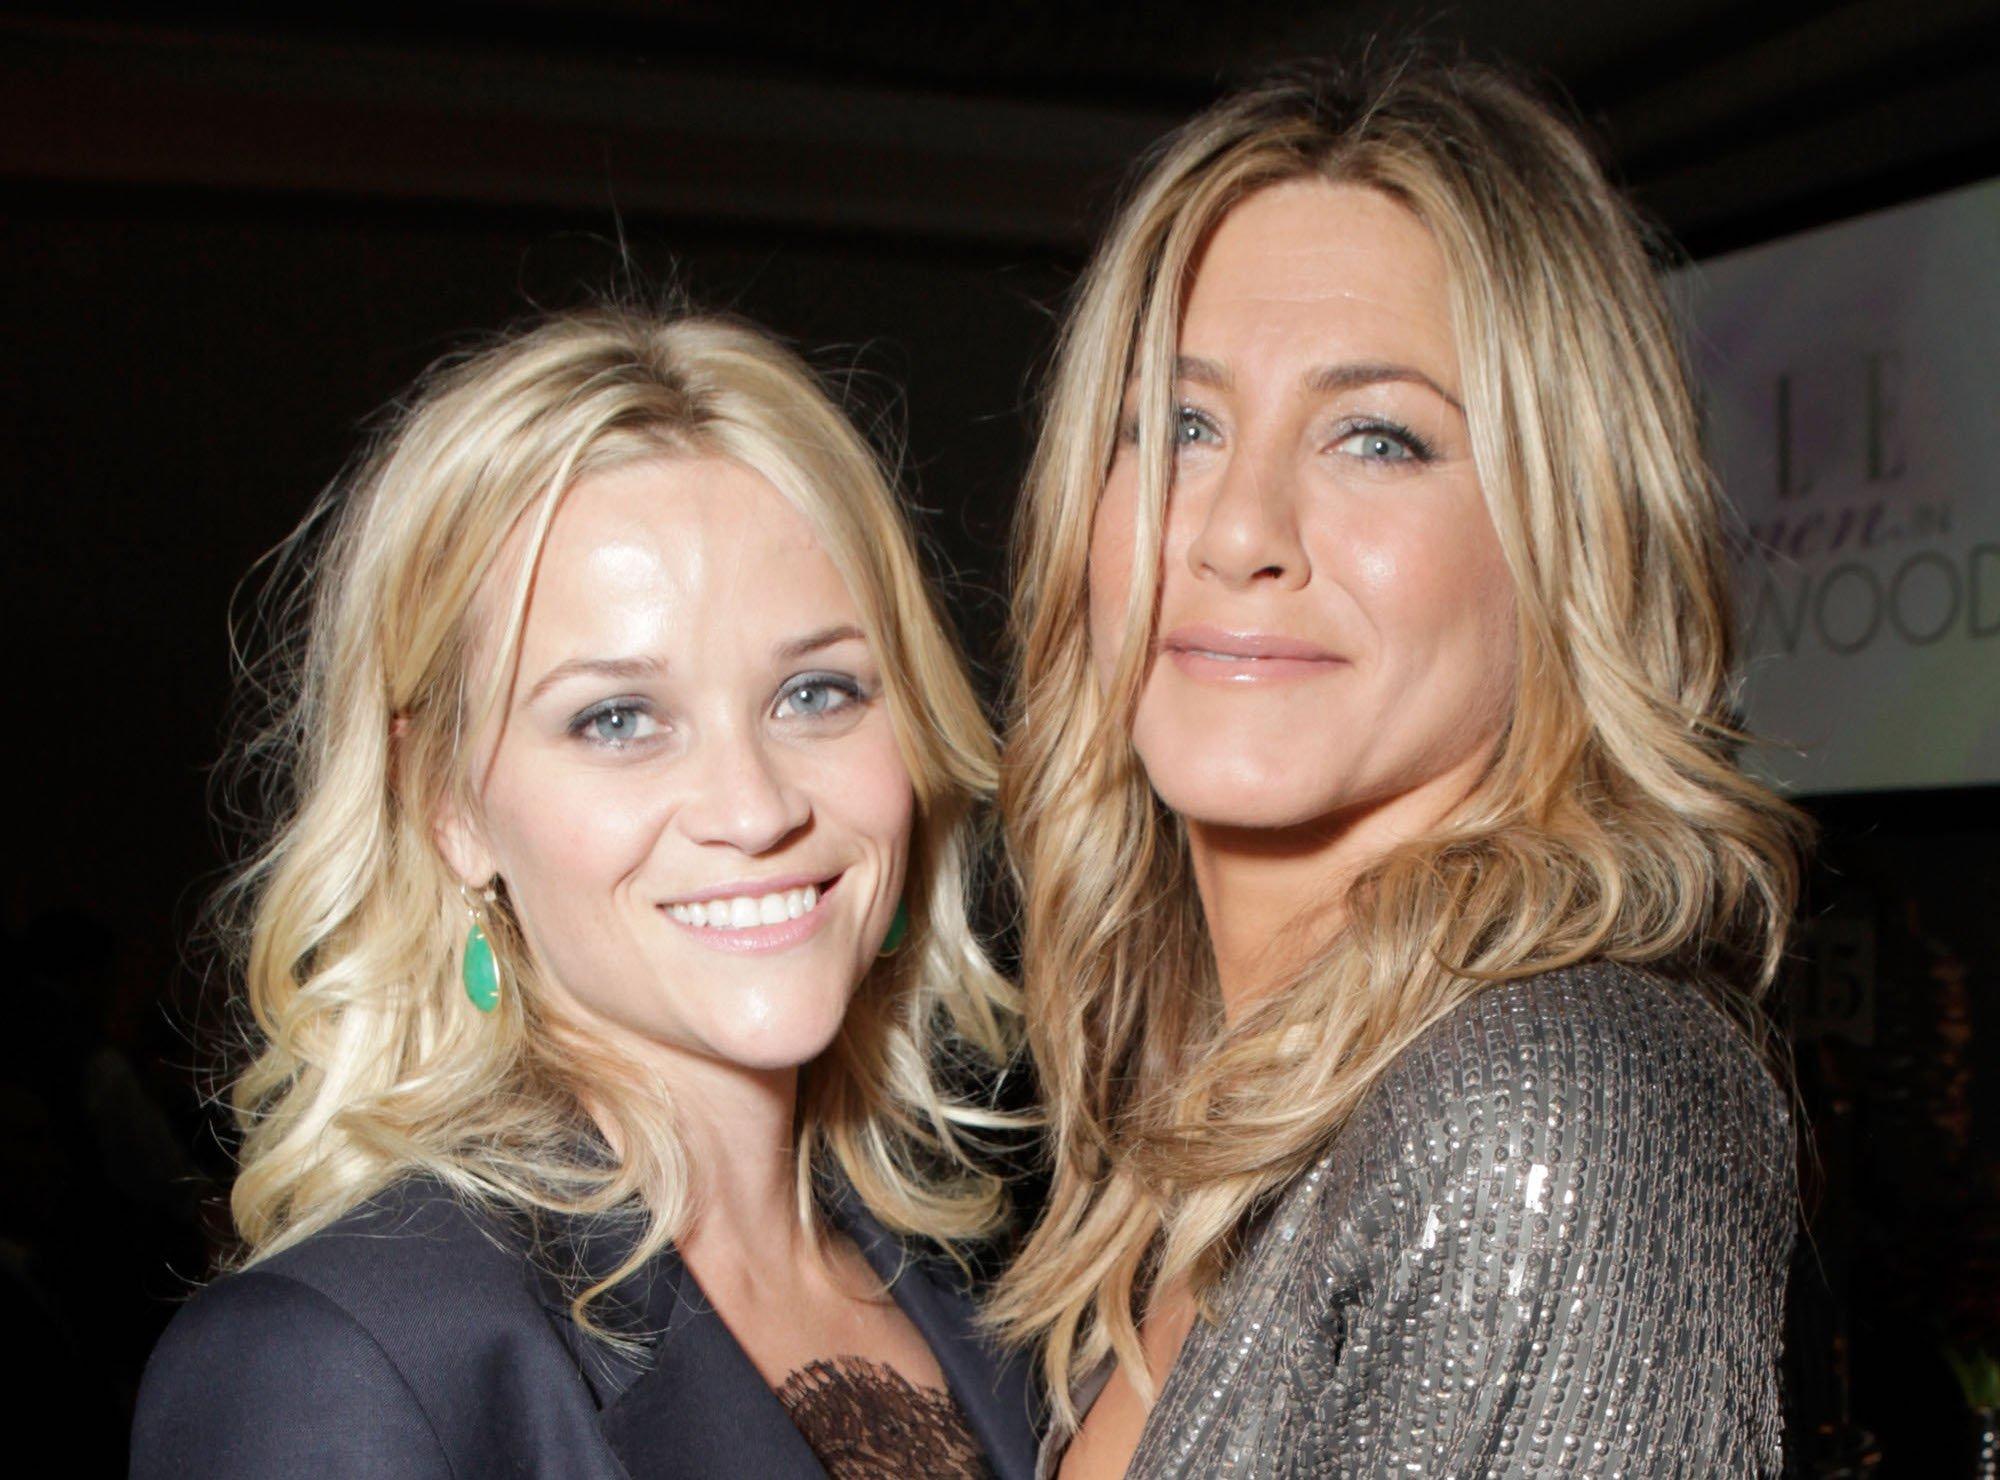 Apple orders two seasons of Jennifer Aniston, Reese Witherspoon TV drama https://t.co/msVZGrU5Rn by @etherington https://t.co/6oLYie3kmg